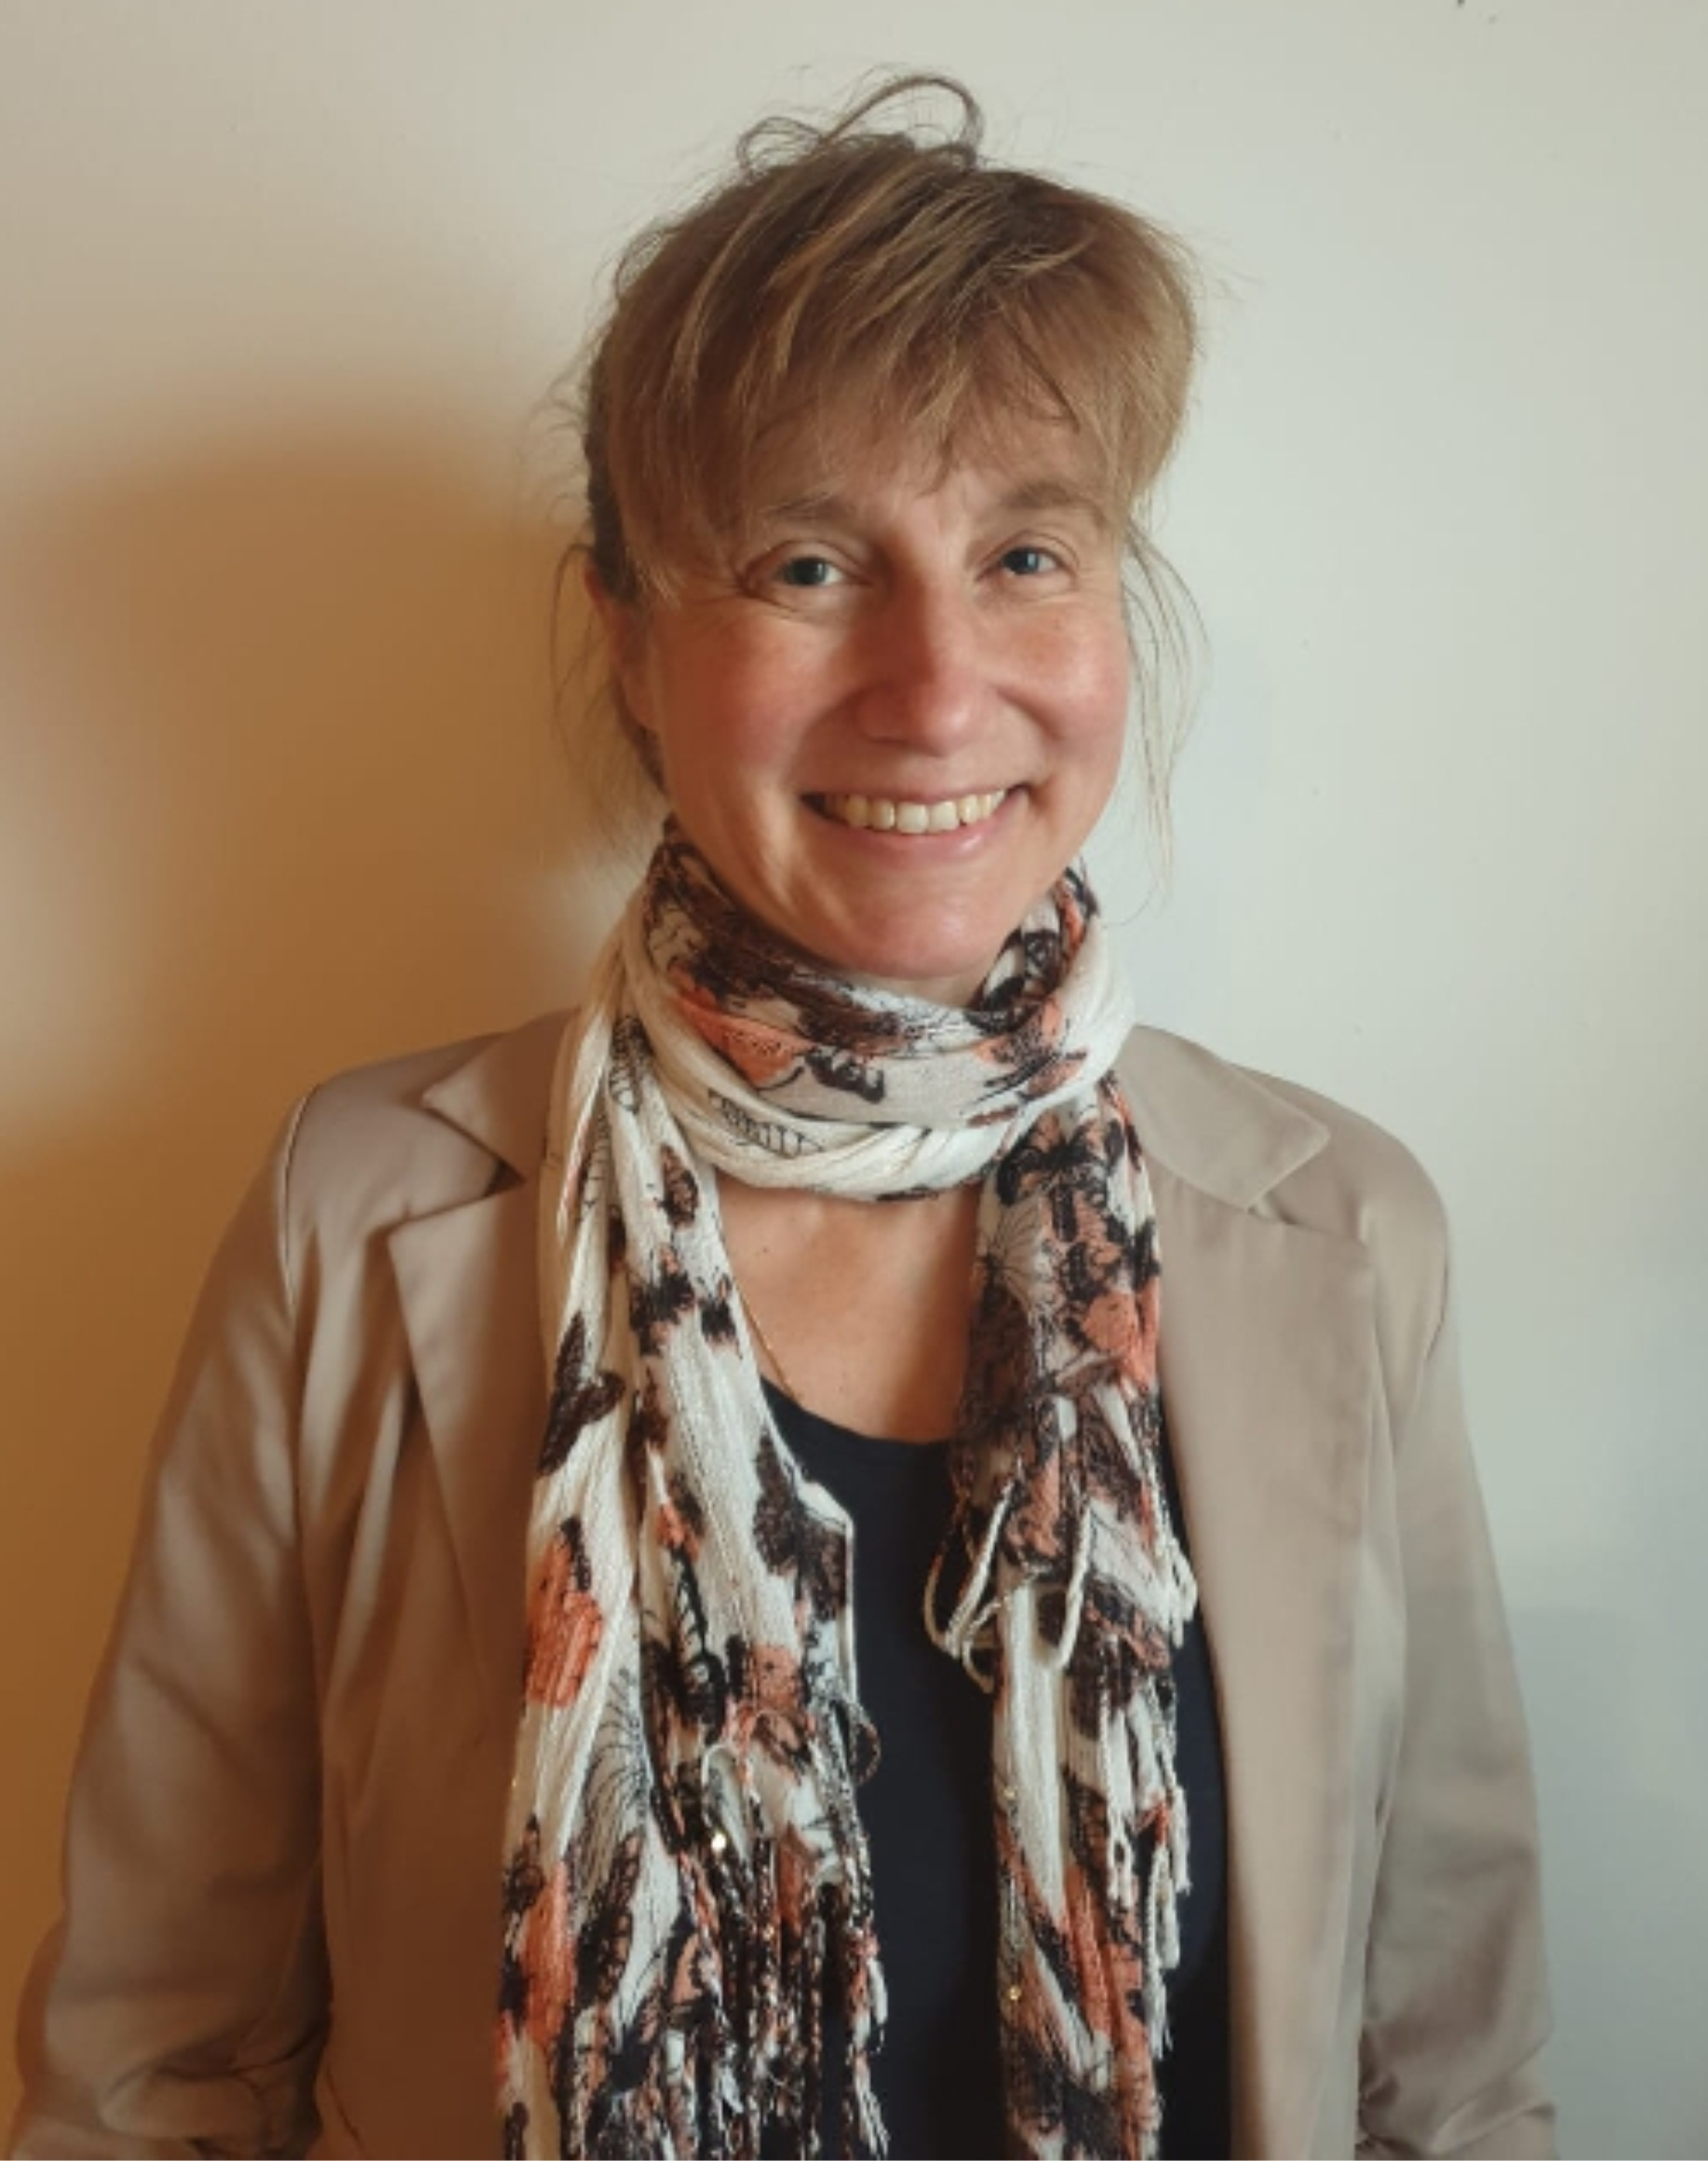 Dr. Martina Kuhtz-Böhnke